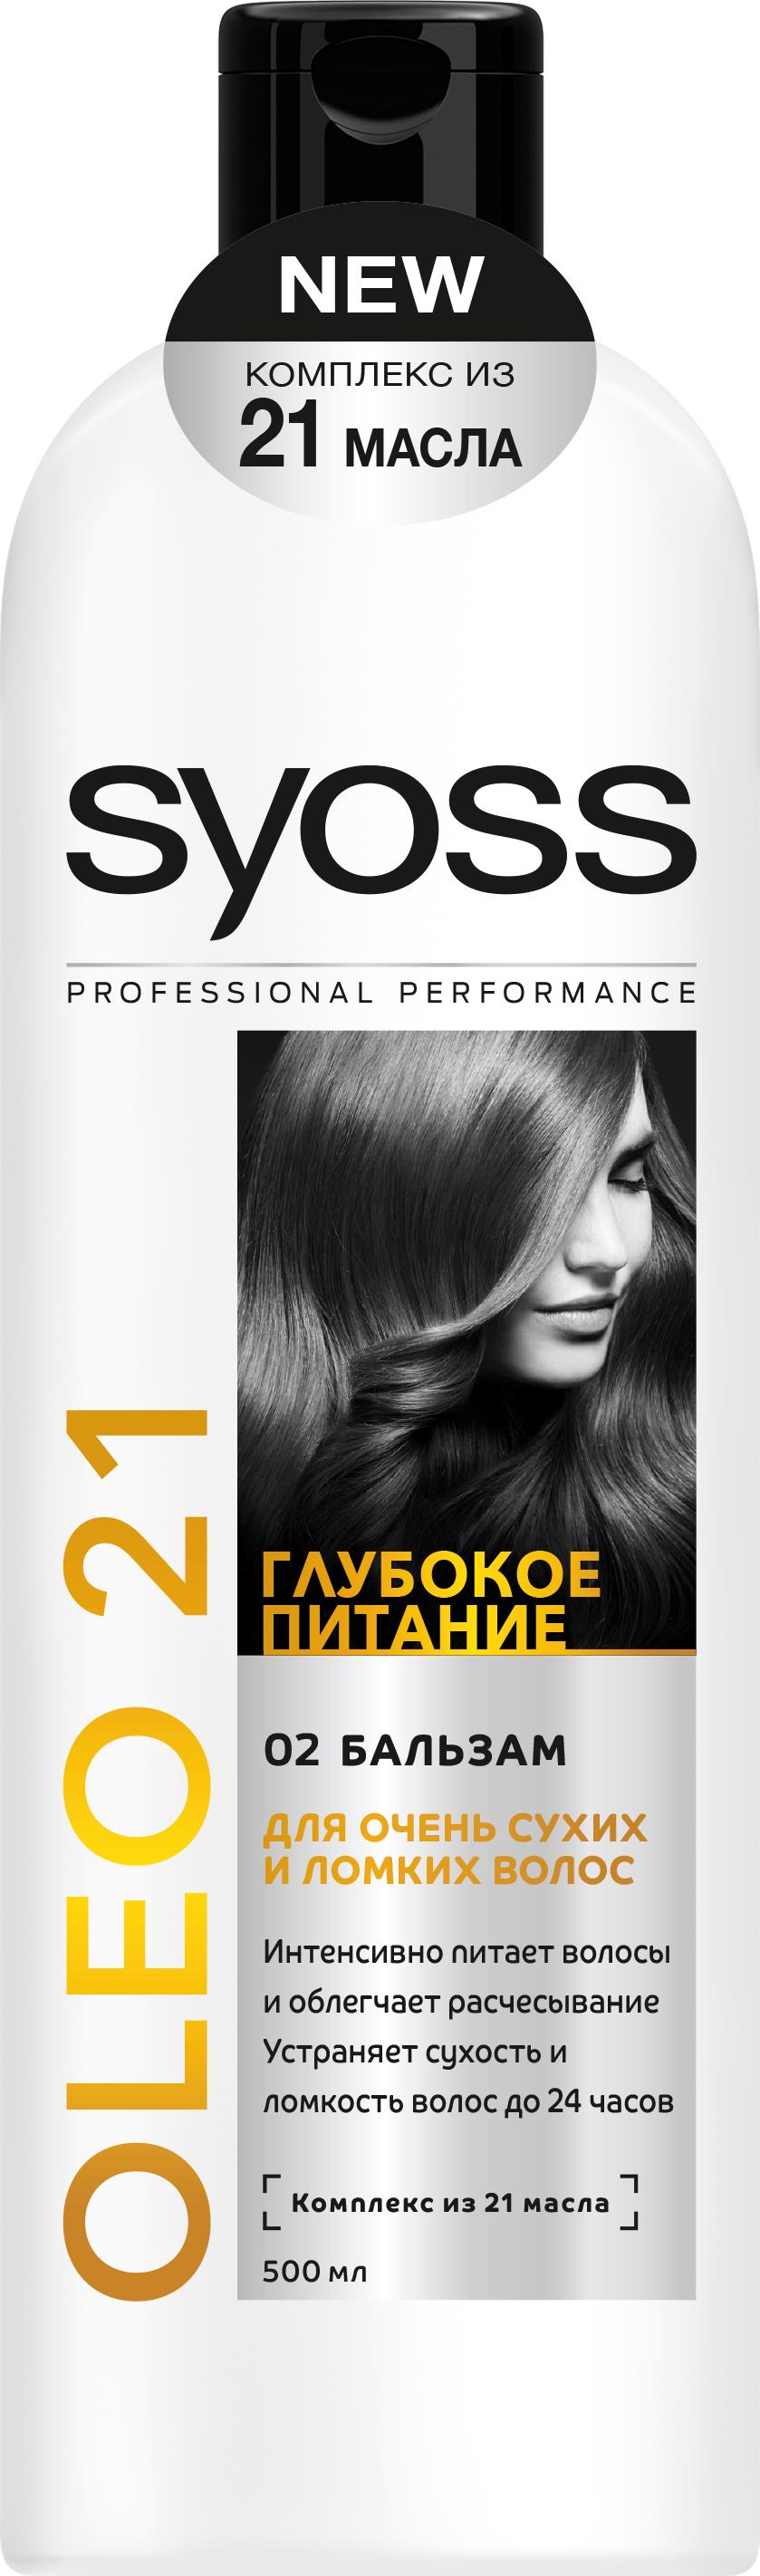 Syoss Бальзам Oleo Intense Thermo Care, для сухих и ломких волос, 500 мл